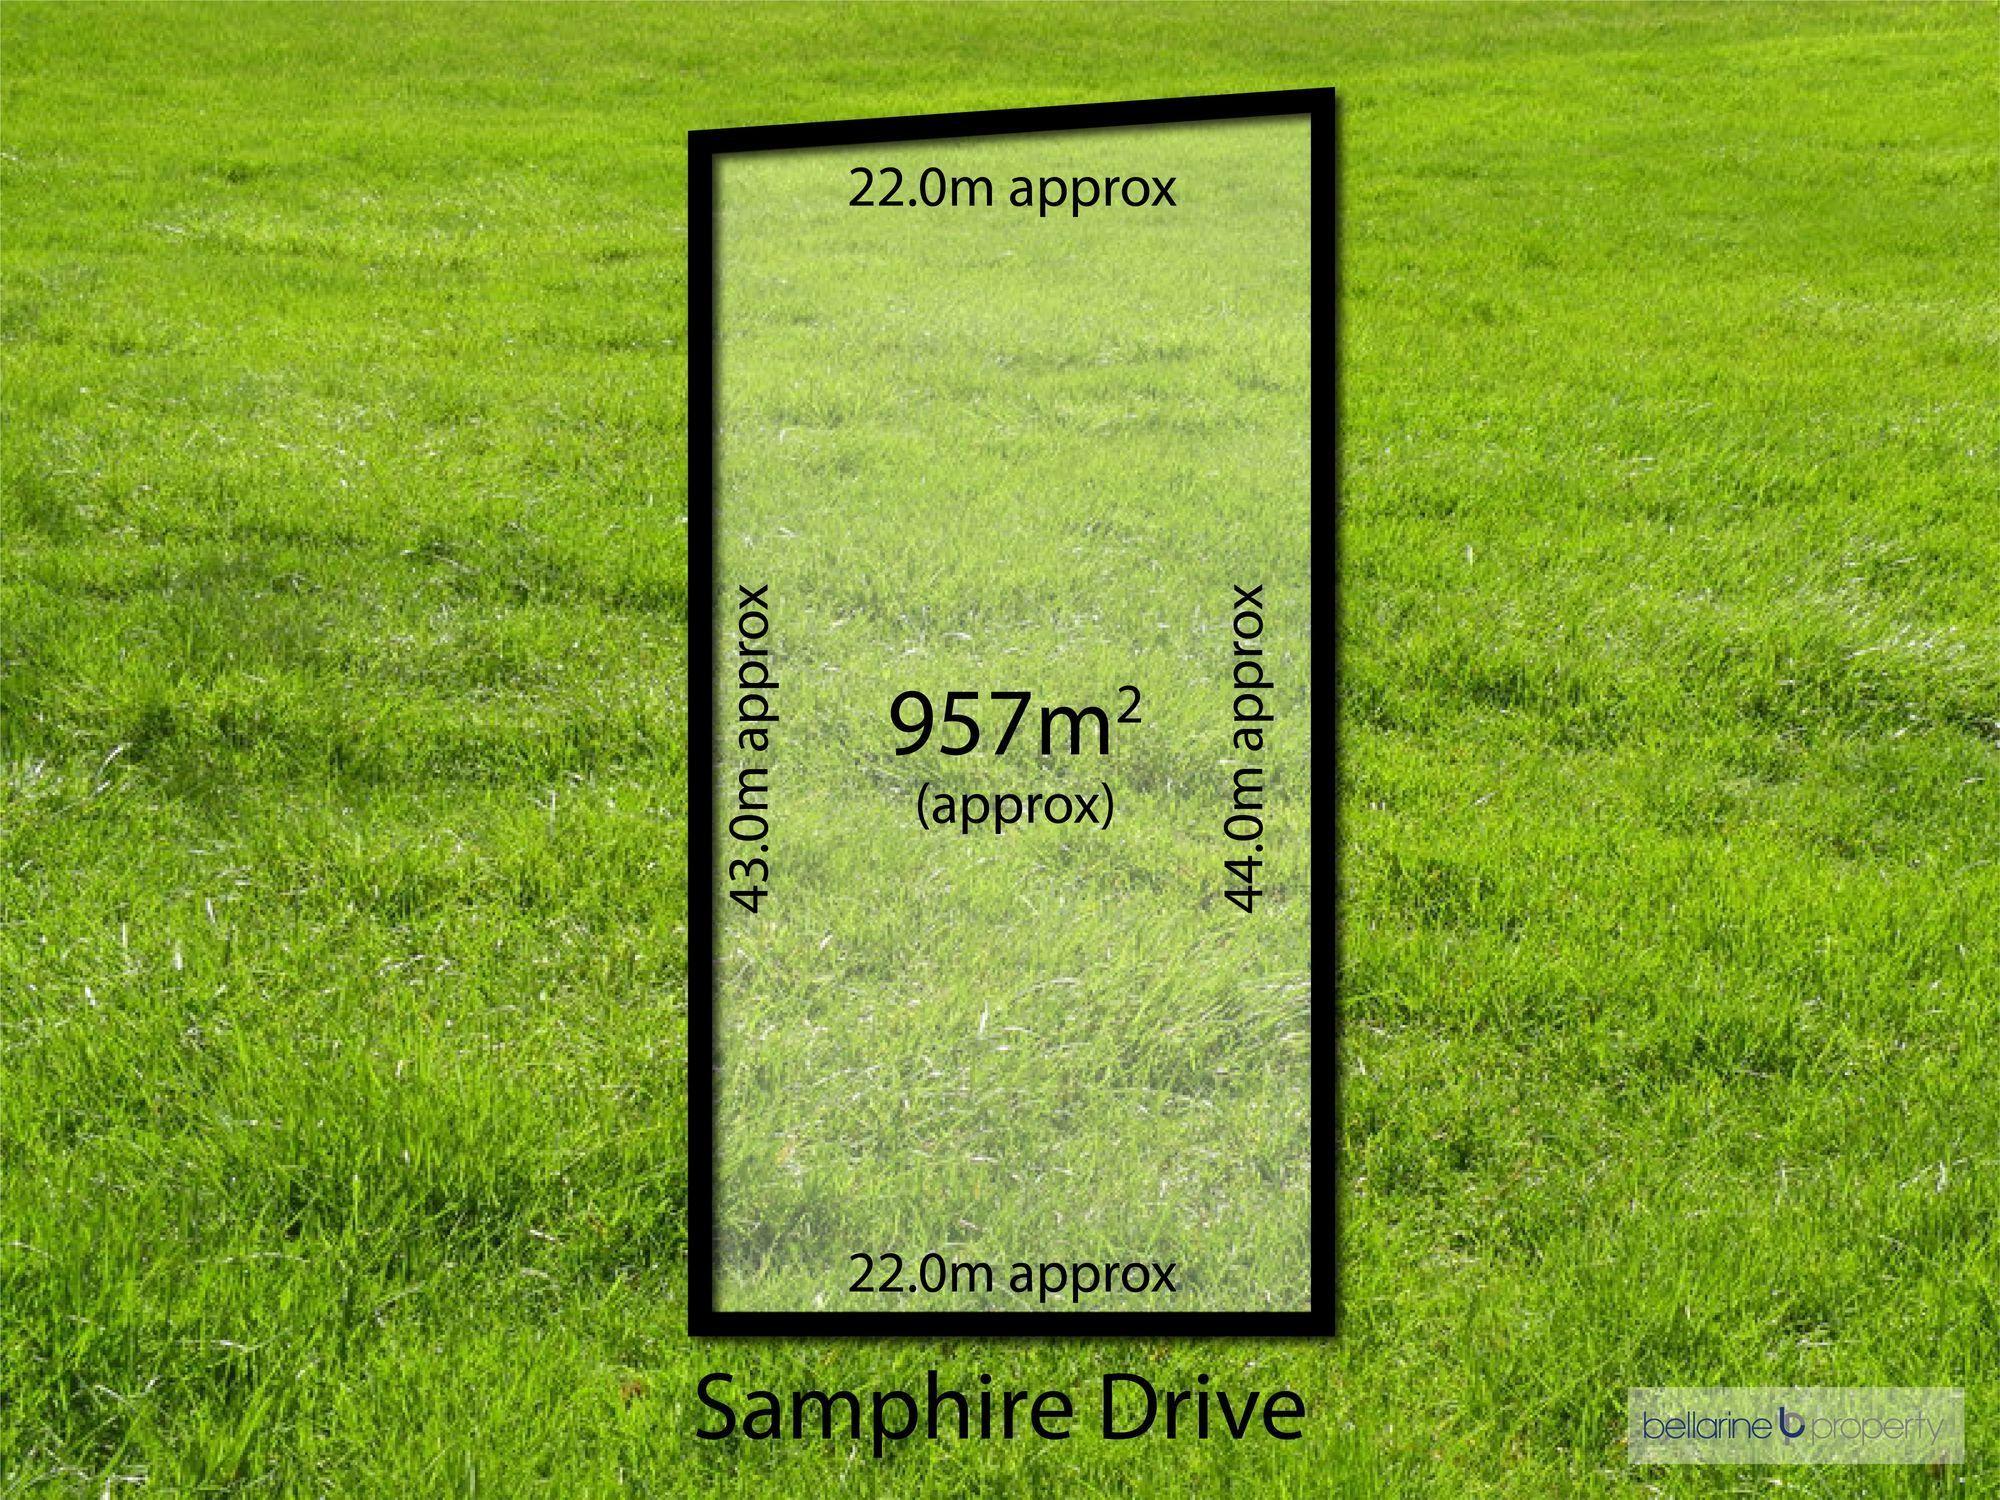 38 Samphire Drive, Connewarre VIC 3227